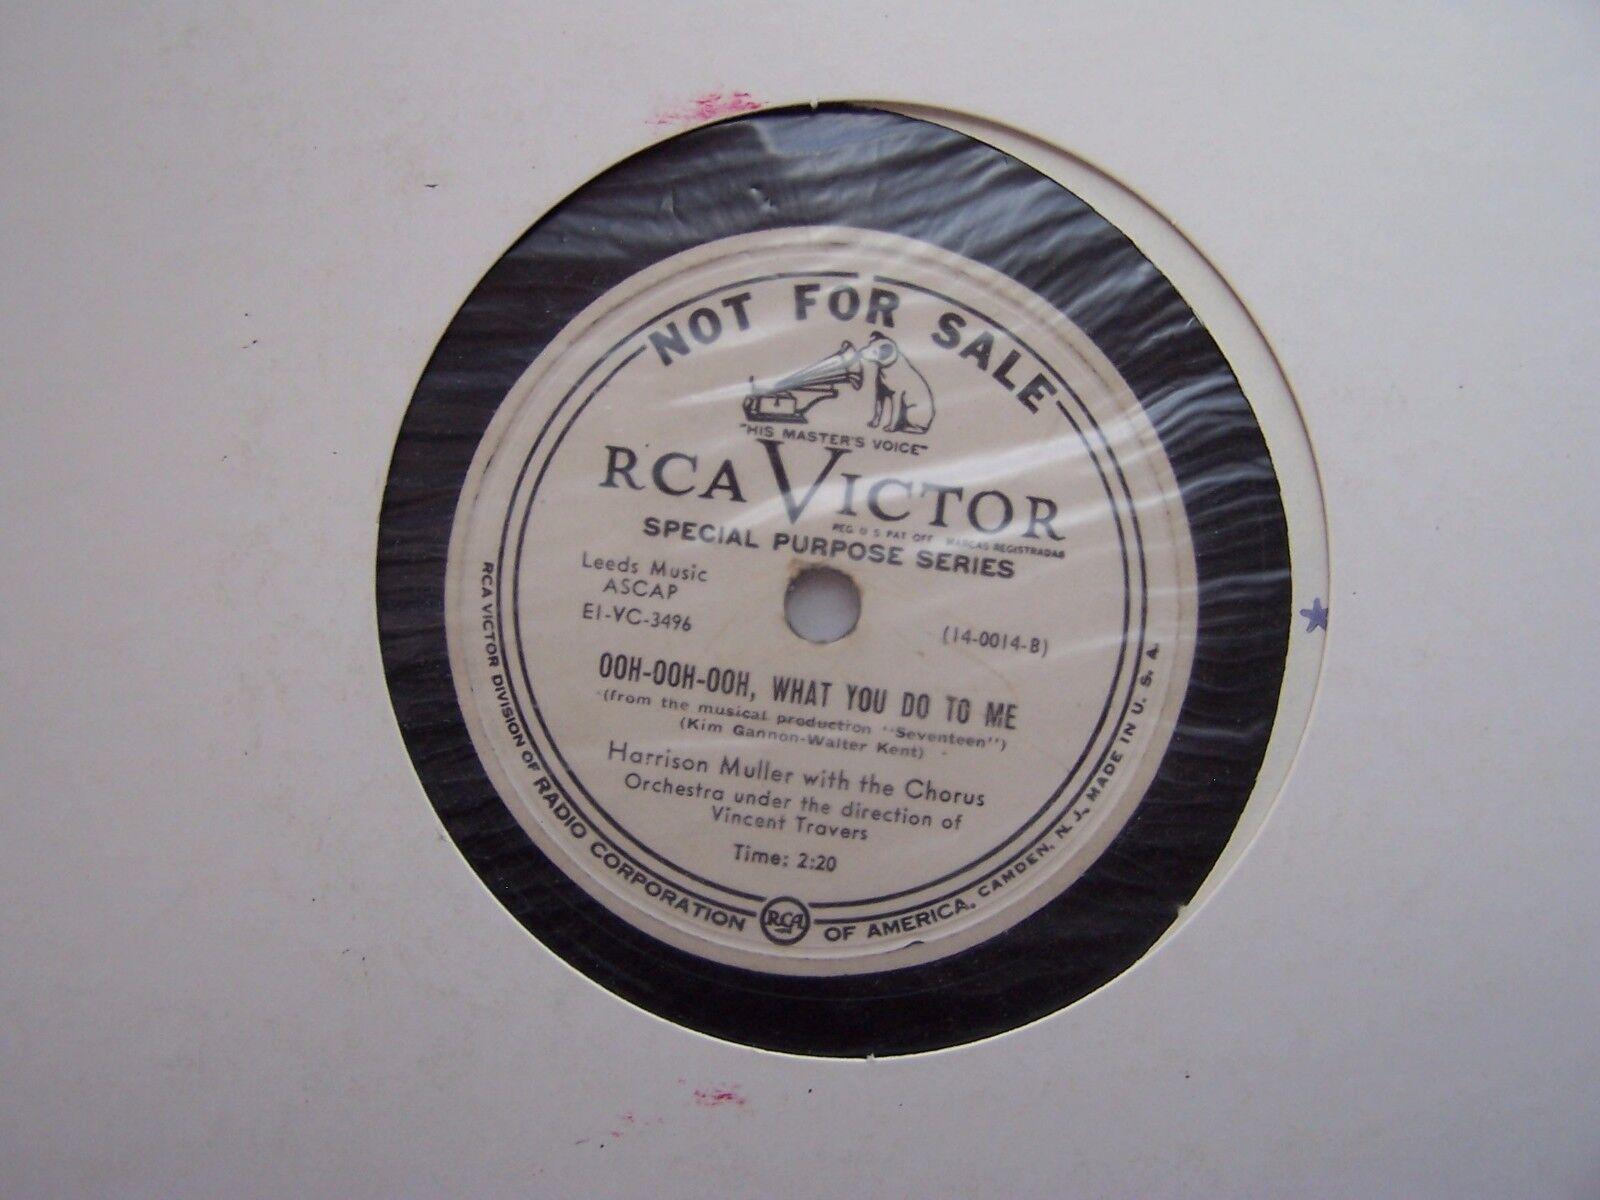 "RCA Victor Special Purpose Series PROMO 12"" 78RPM Vinyl"